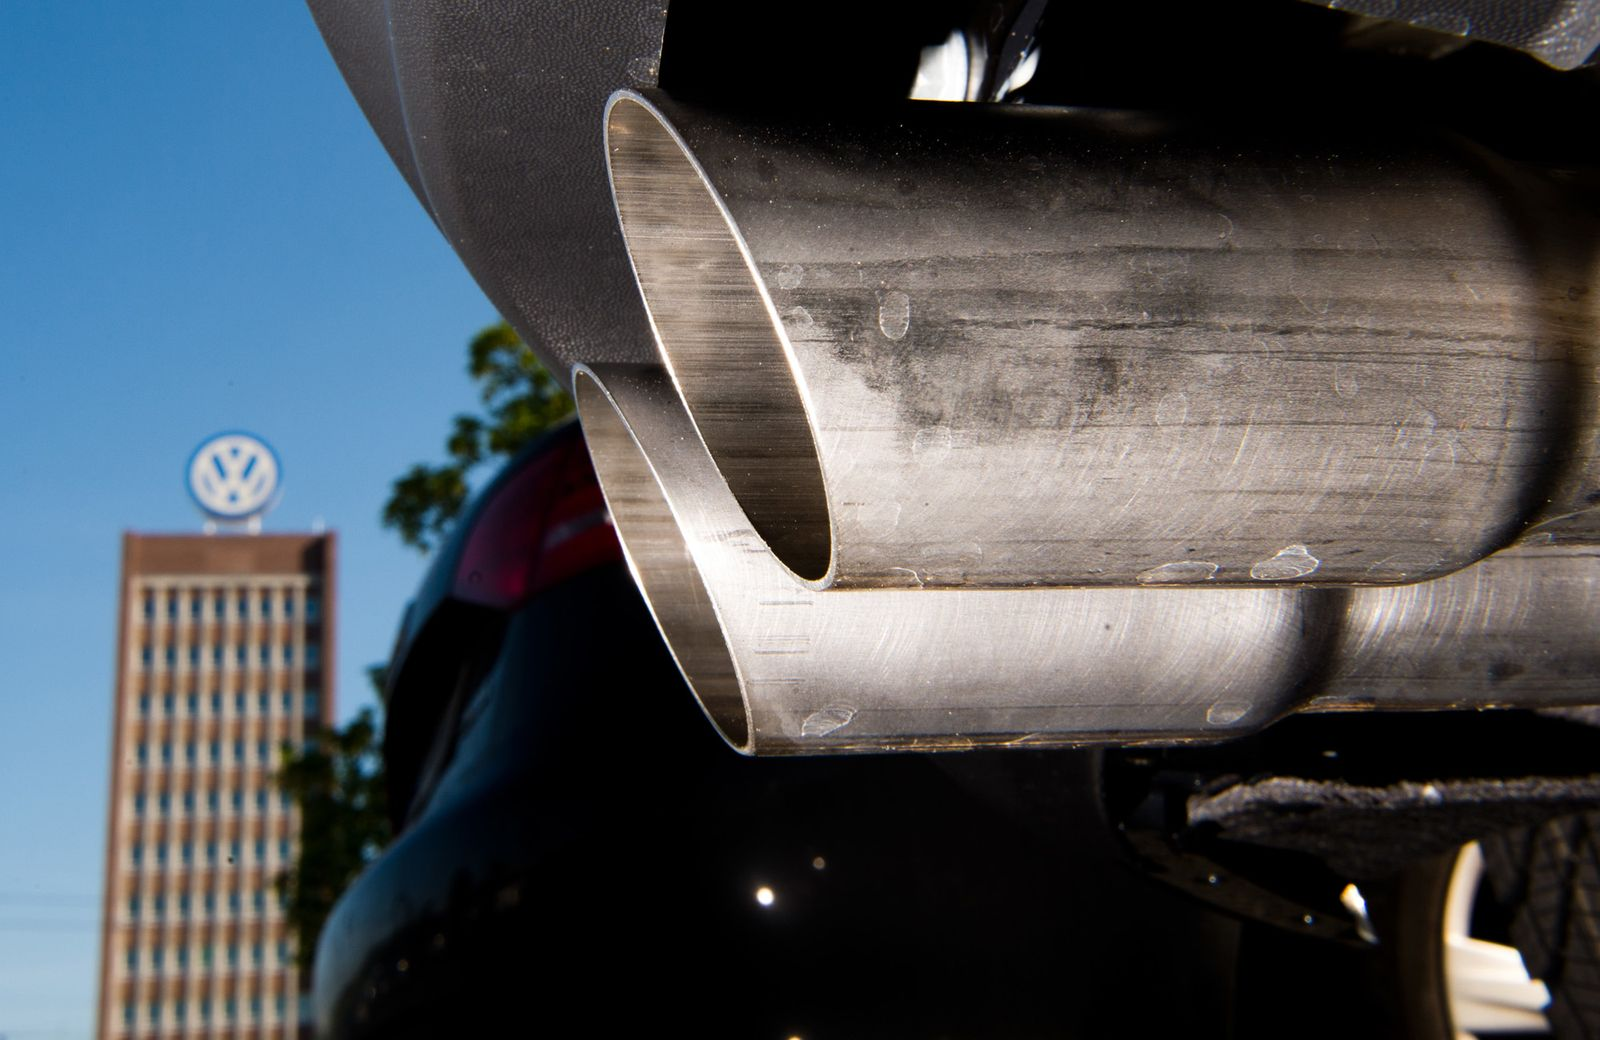 Abgasuntersuchung / Dieselfahrzeug